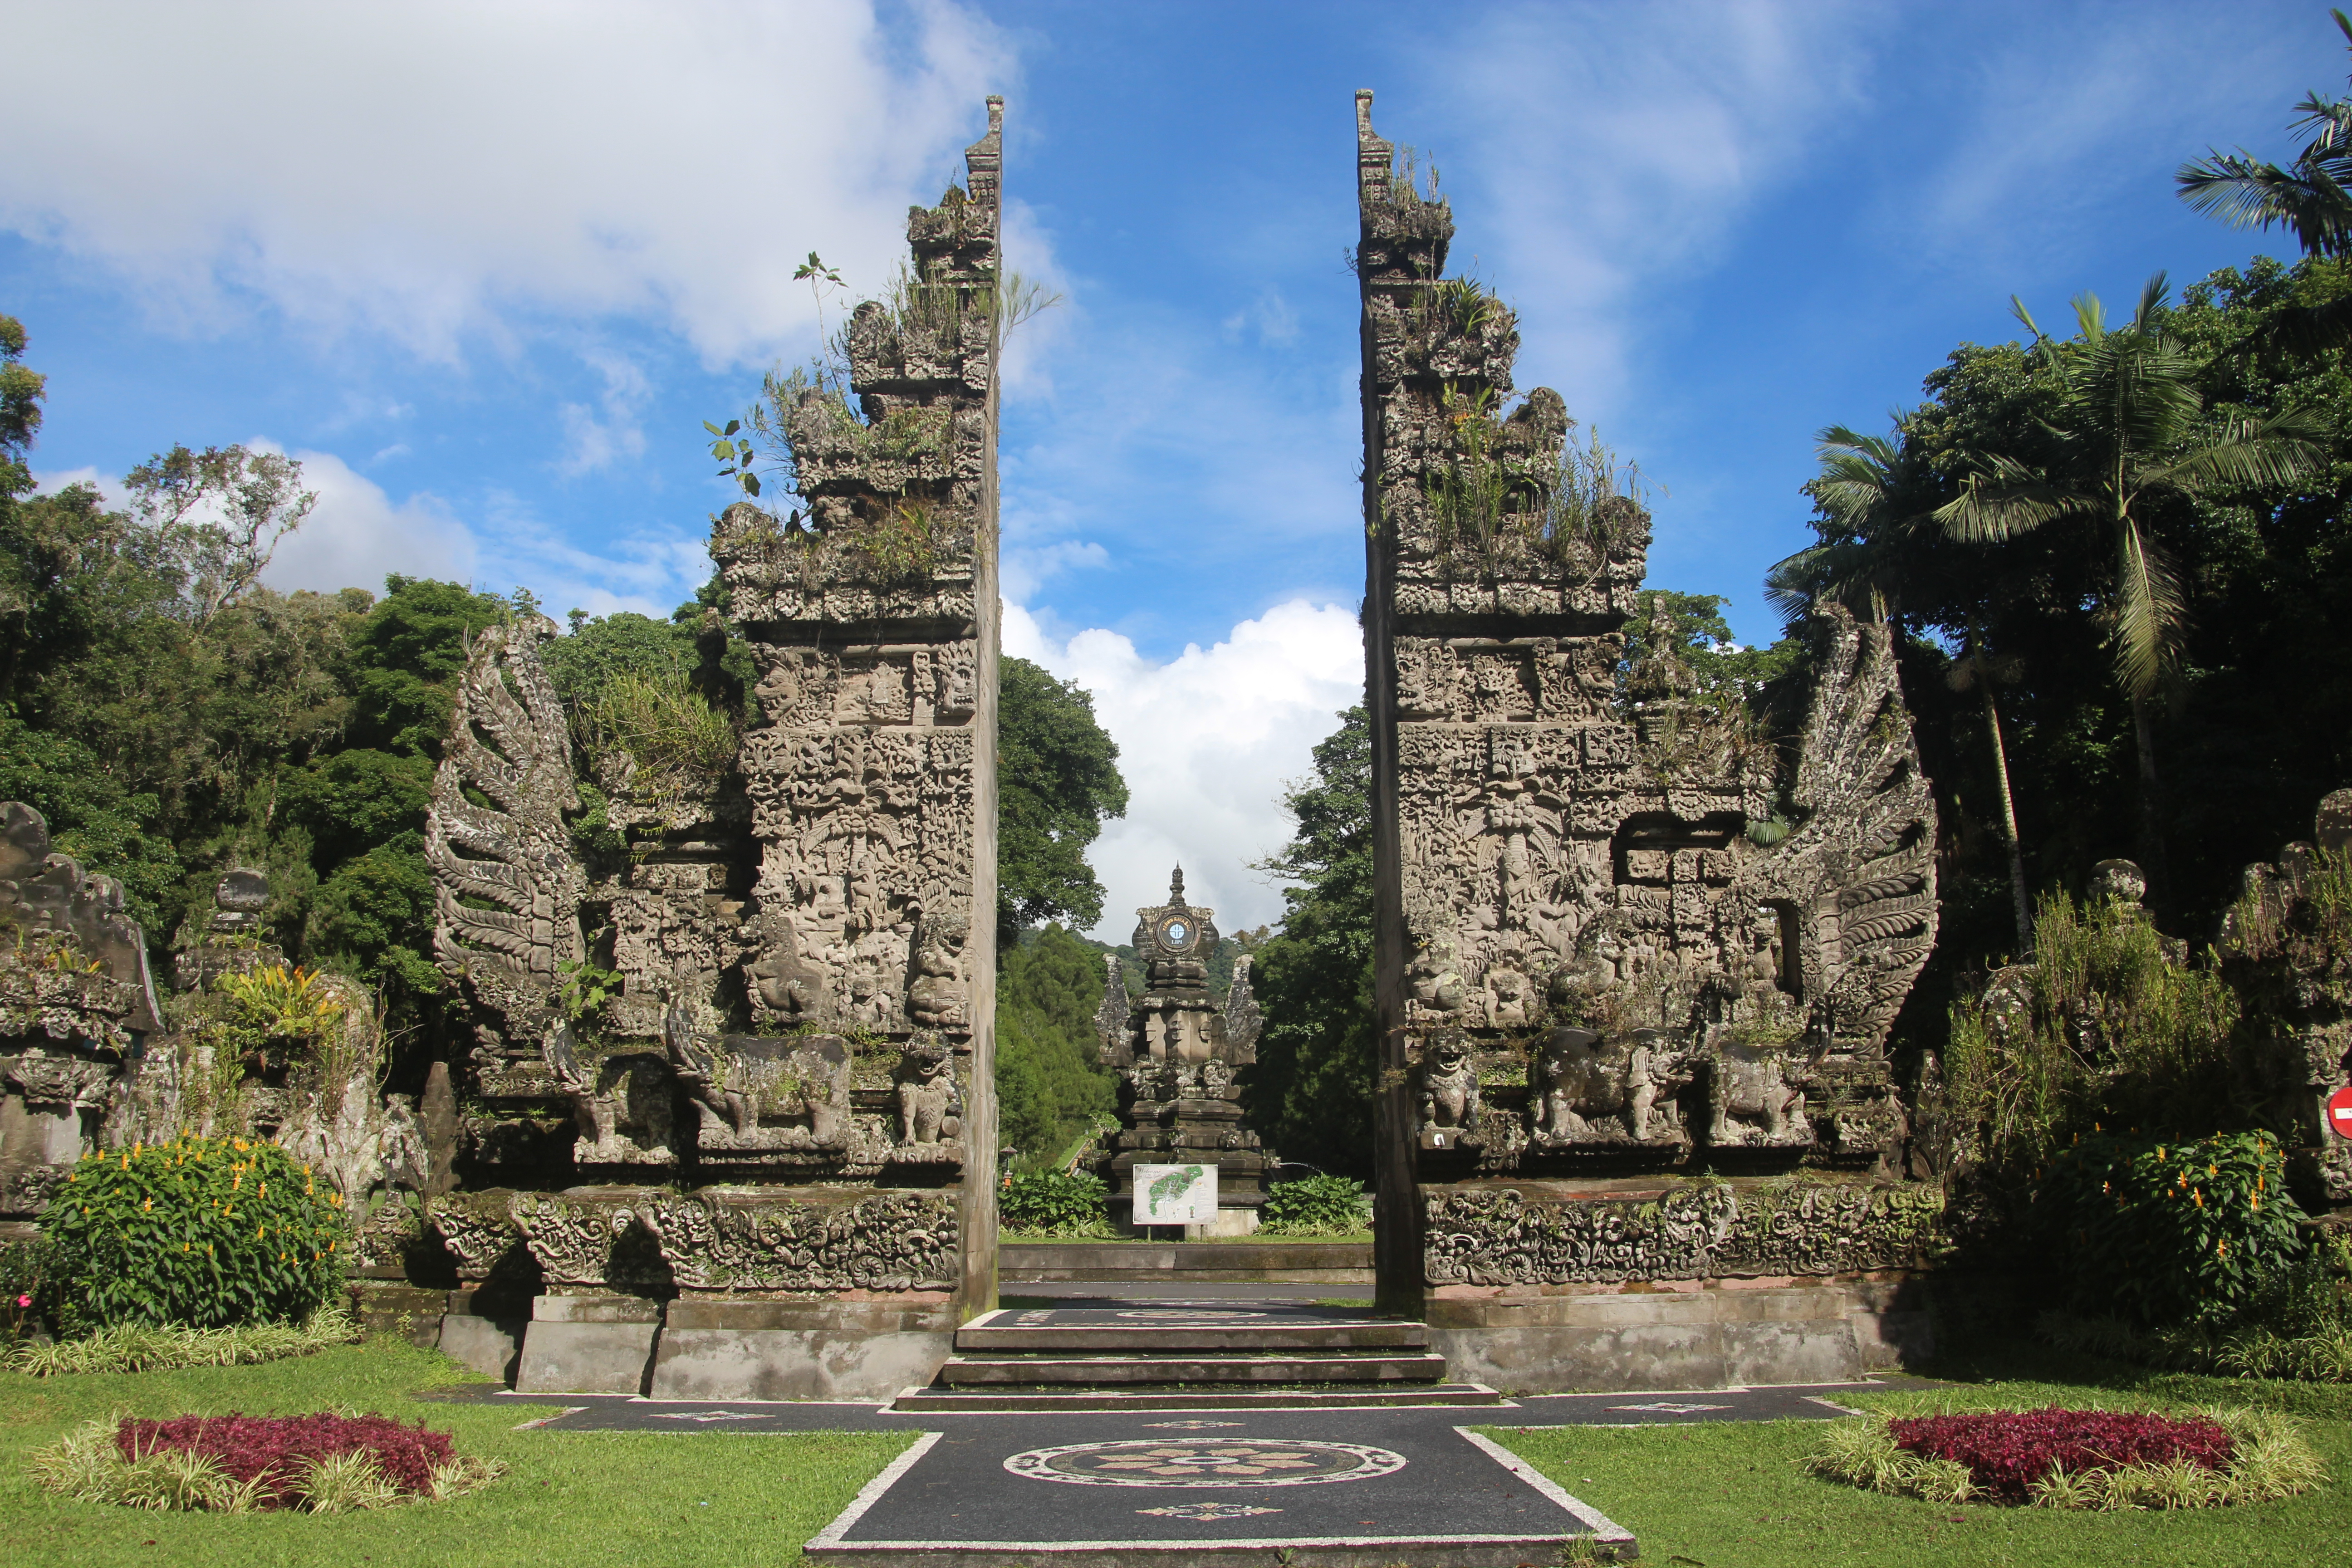 Kebun Raya Bali Wikipedia Bahasa Indonesia Ensiklopedia Bebas Candi Bentar